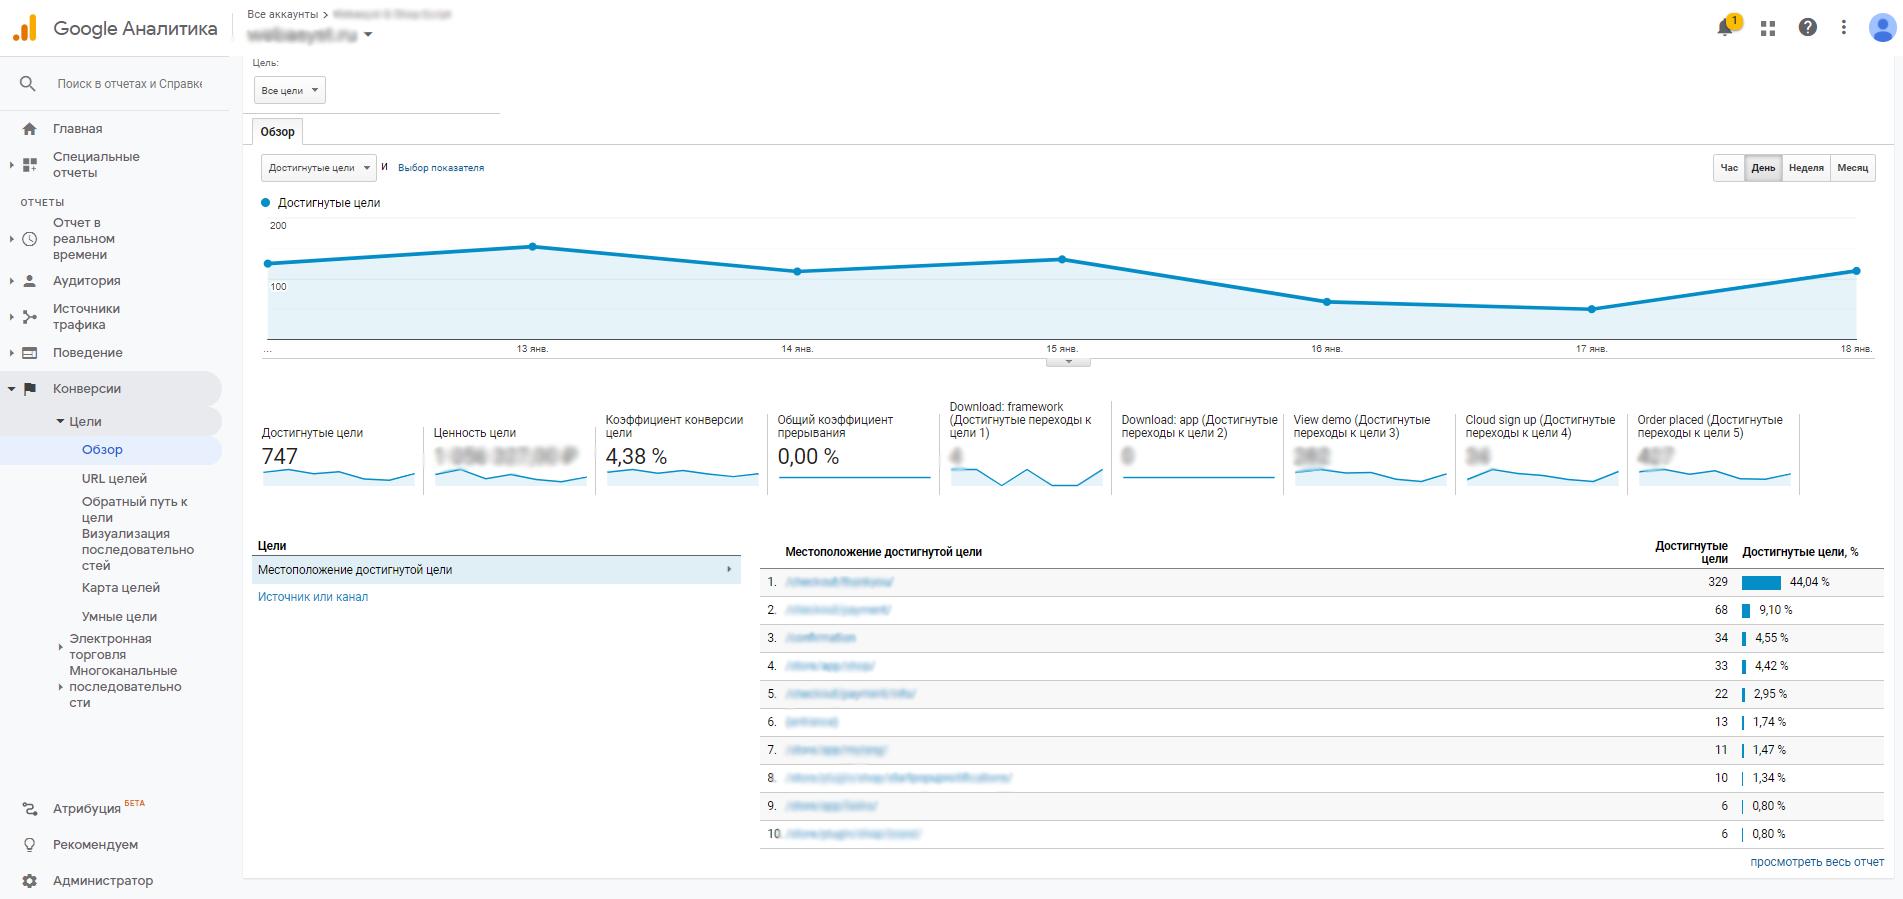 Отчет по конверсиям Google Analytics